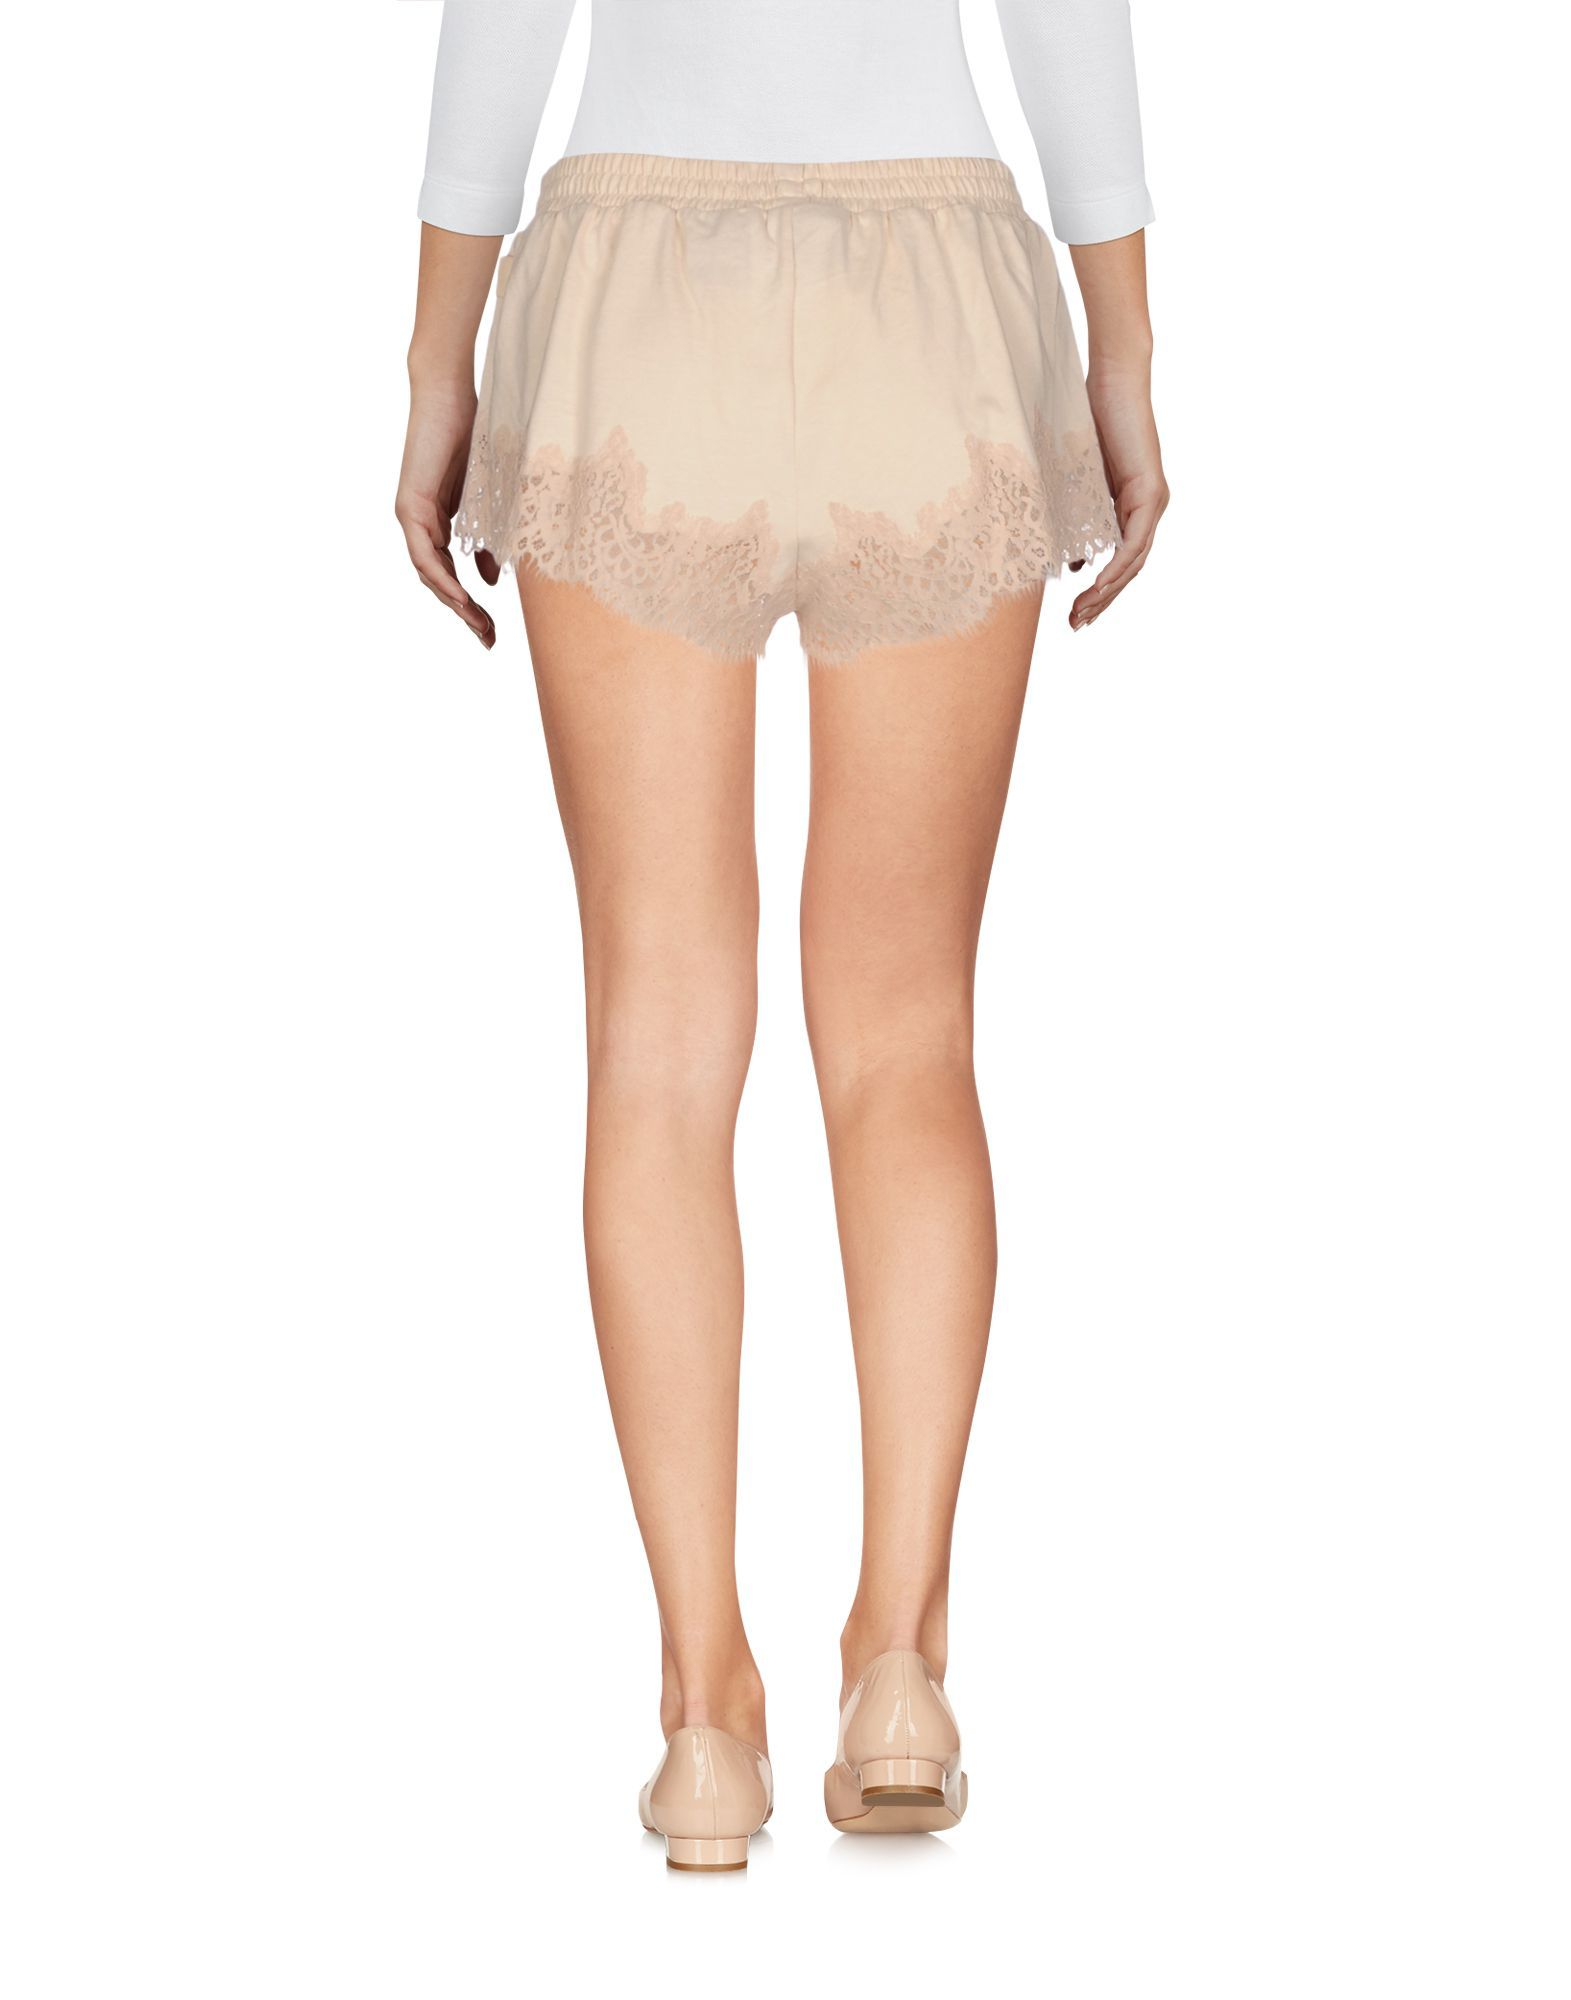 Fenty Puma By Rihanna Sand Cotton Lace Shorts